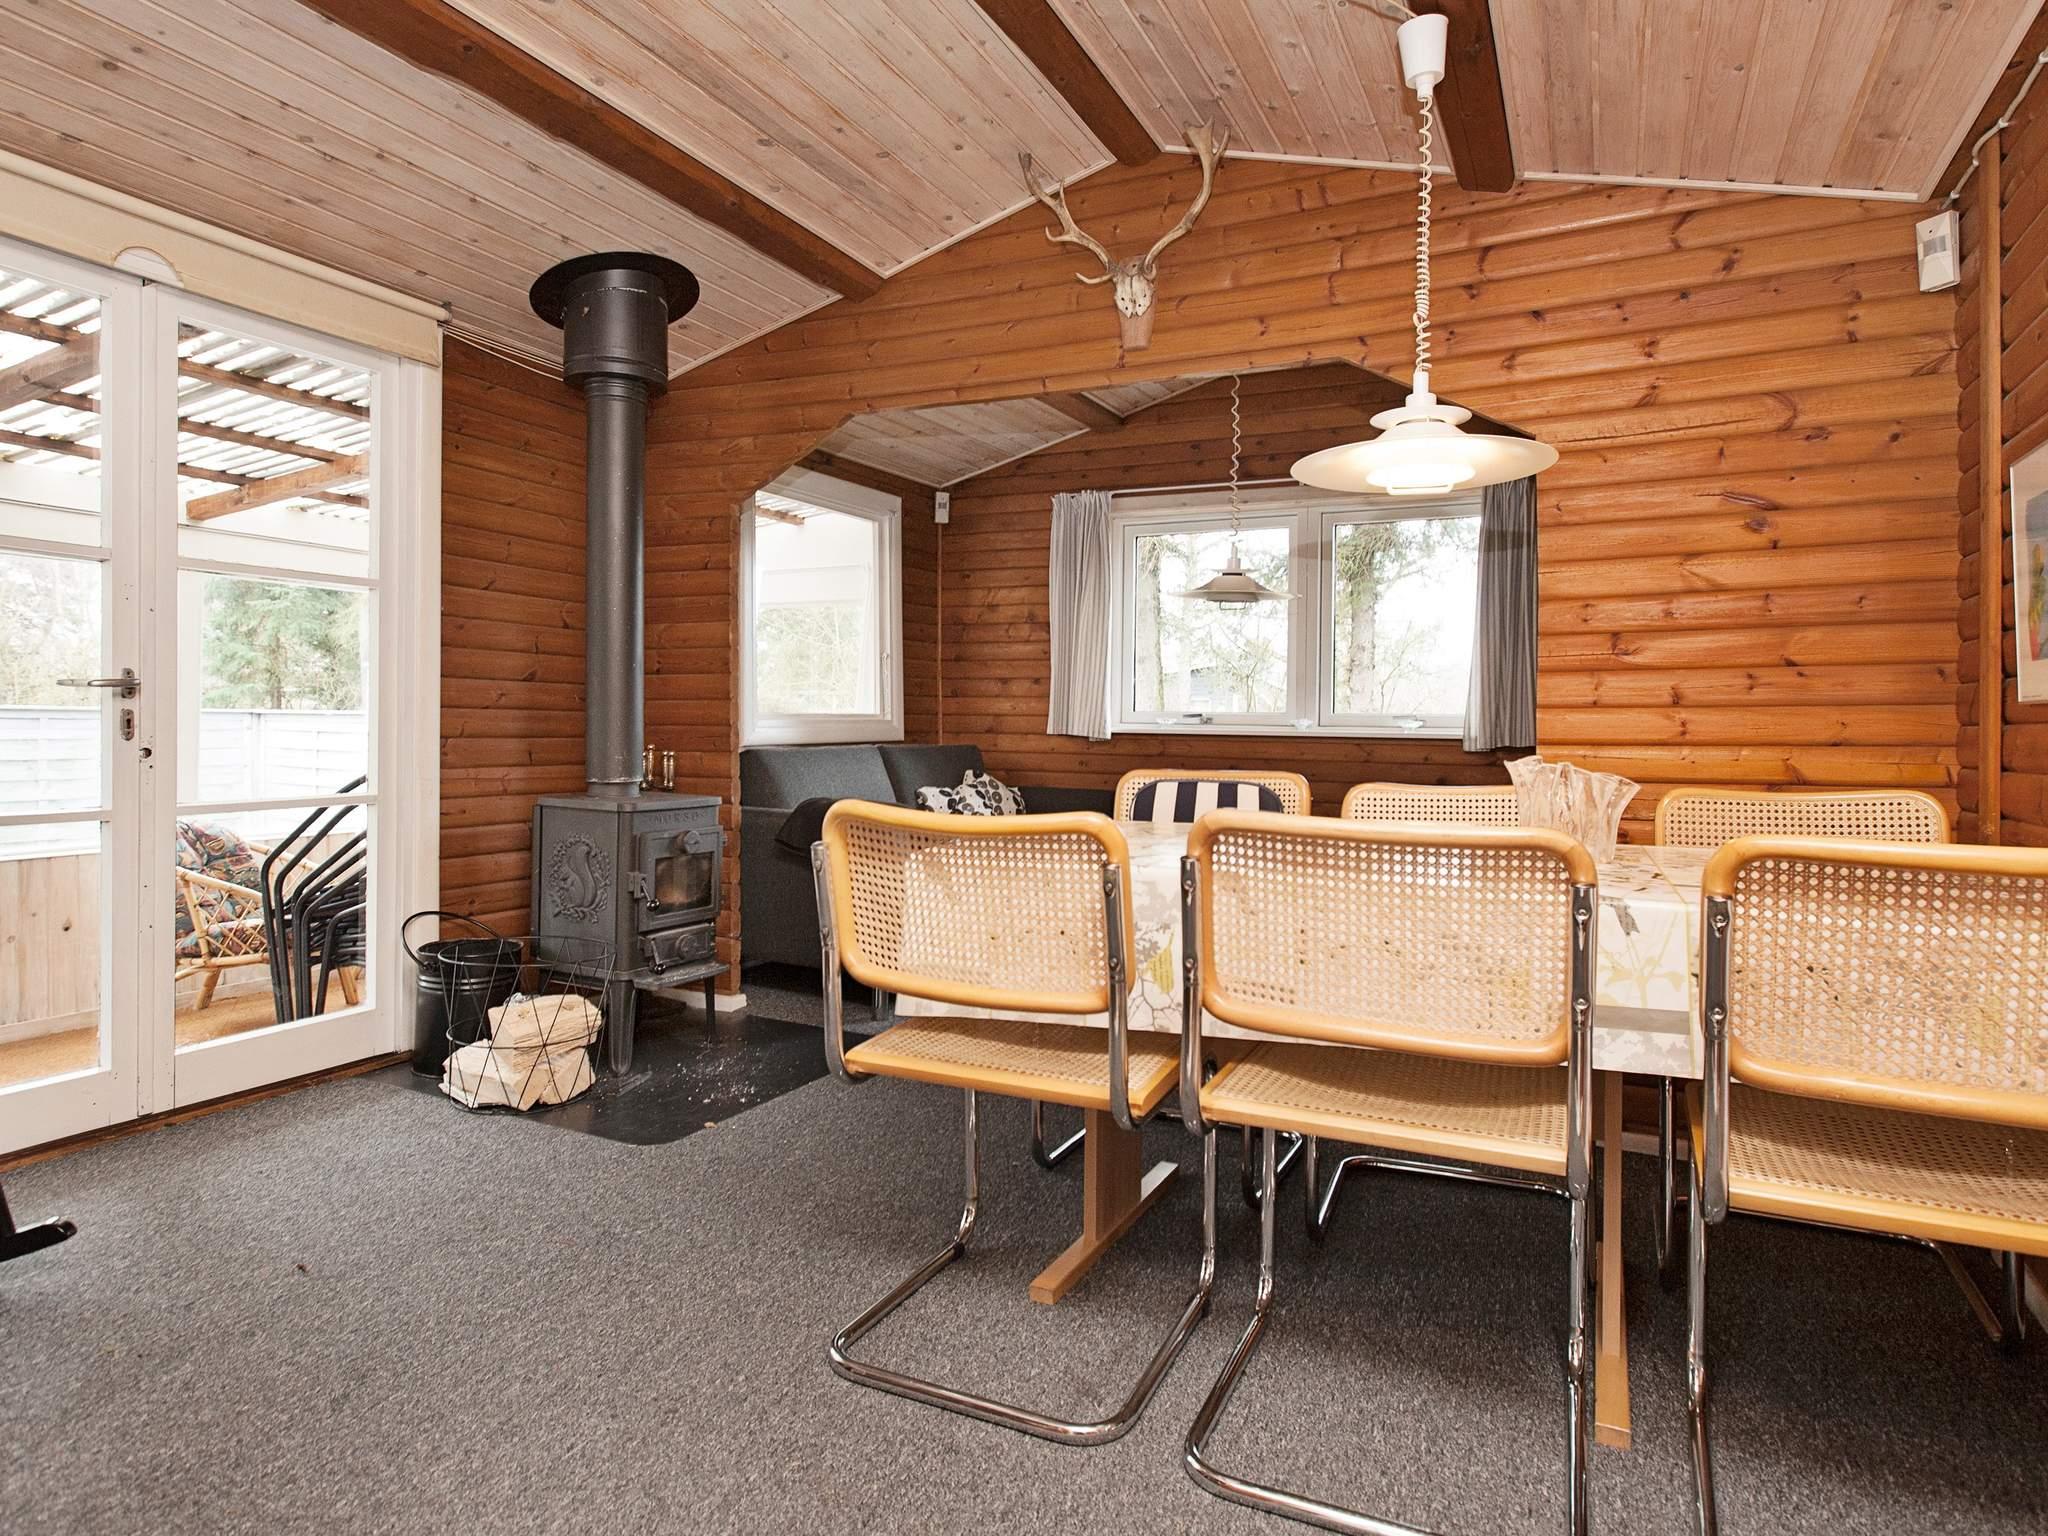 Maison de vacances Kramnitze (87262), Kramnitse, , Lolland, Danemark, image 9